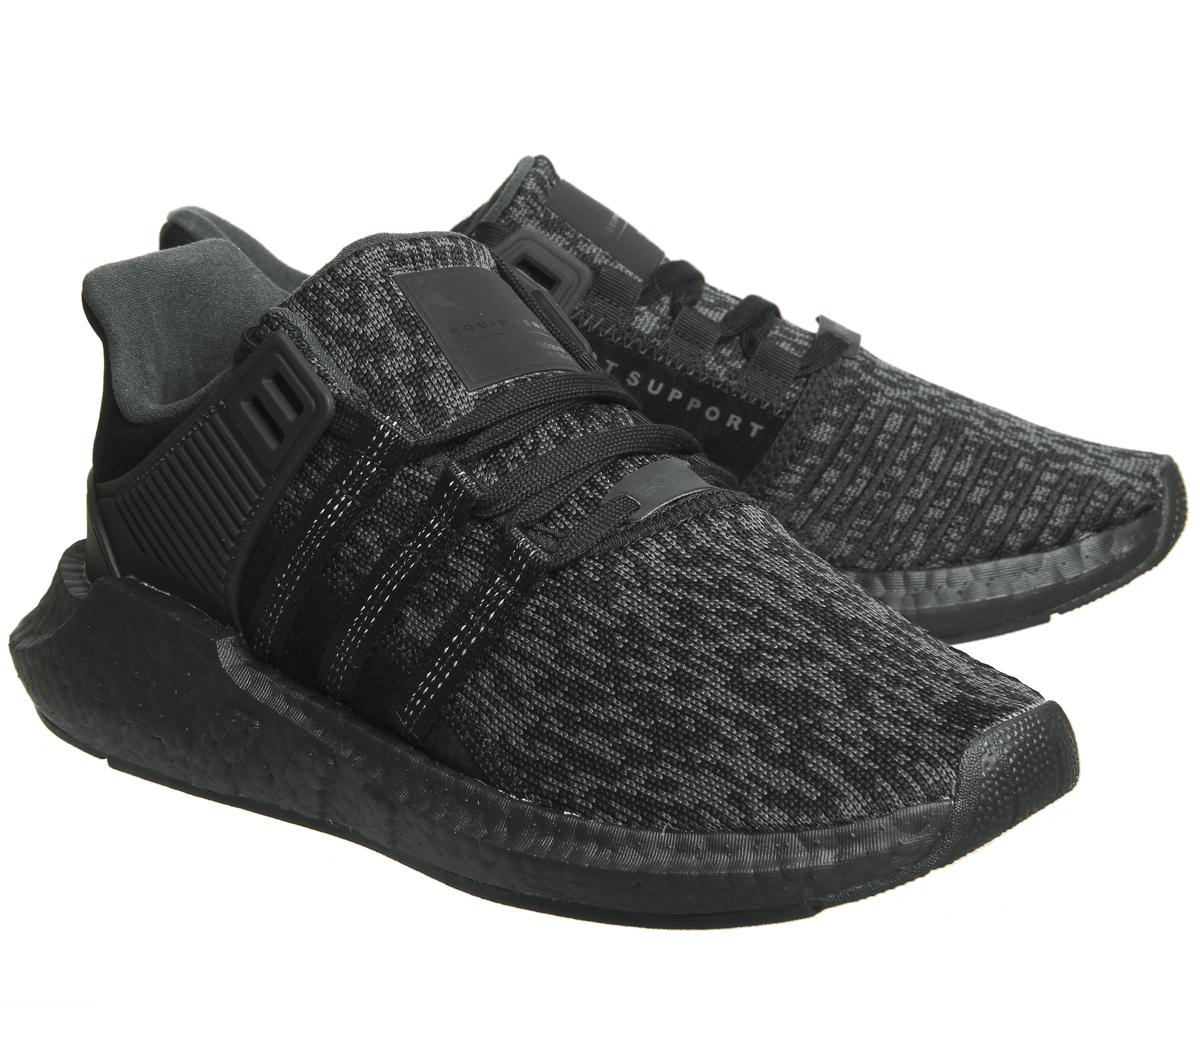 wholesale dealer 5ea06 e0172 Adidas-Eqt-Support-93-17-BLACK-MONO-Trainers-